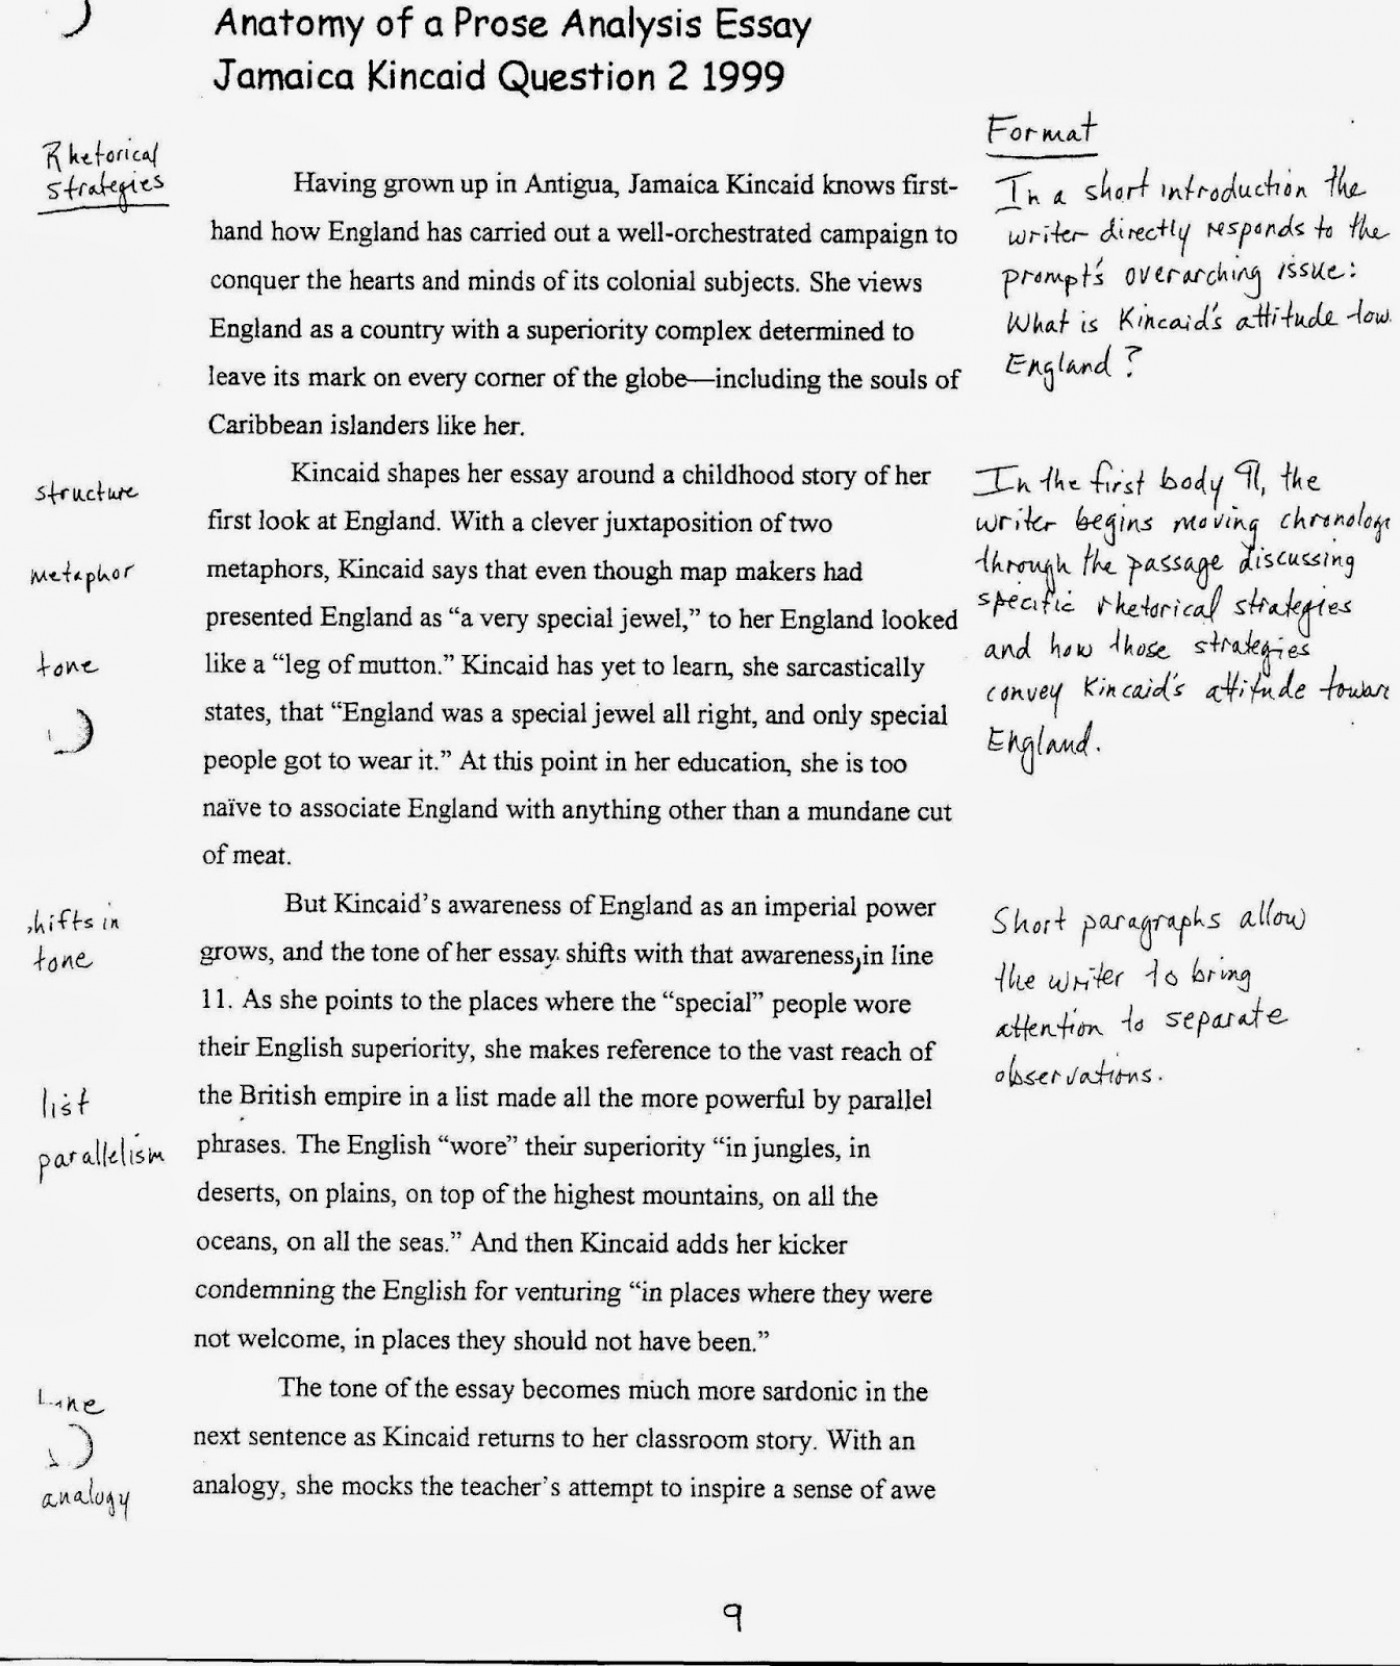 002 Rhetorical Essay Examples Example Of Analysis Essays Goal Blockety Co Using Ethos Pathos And Logo Logos Unusual Ap Lang Mode 1400